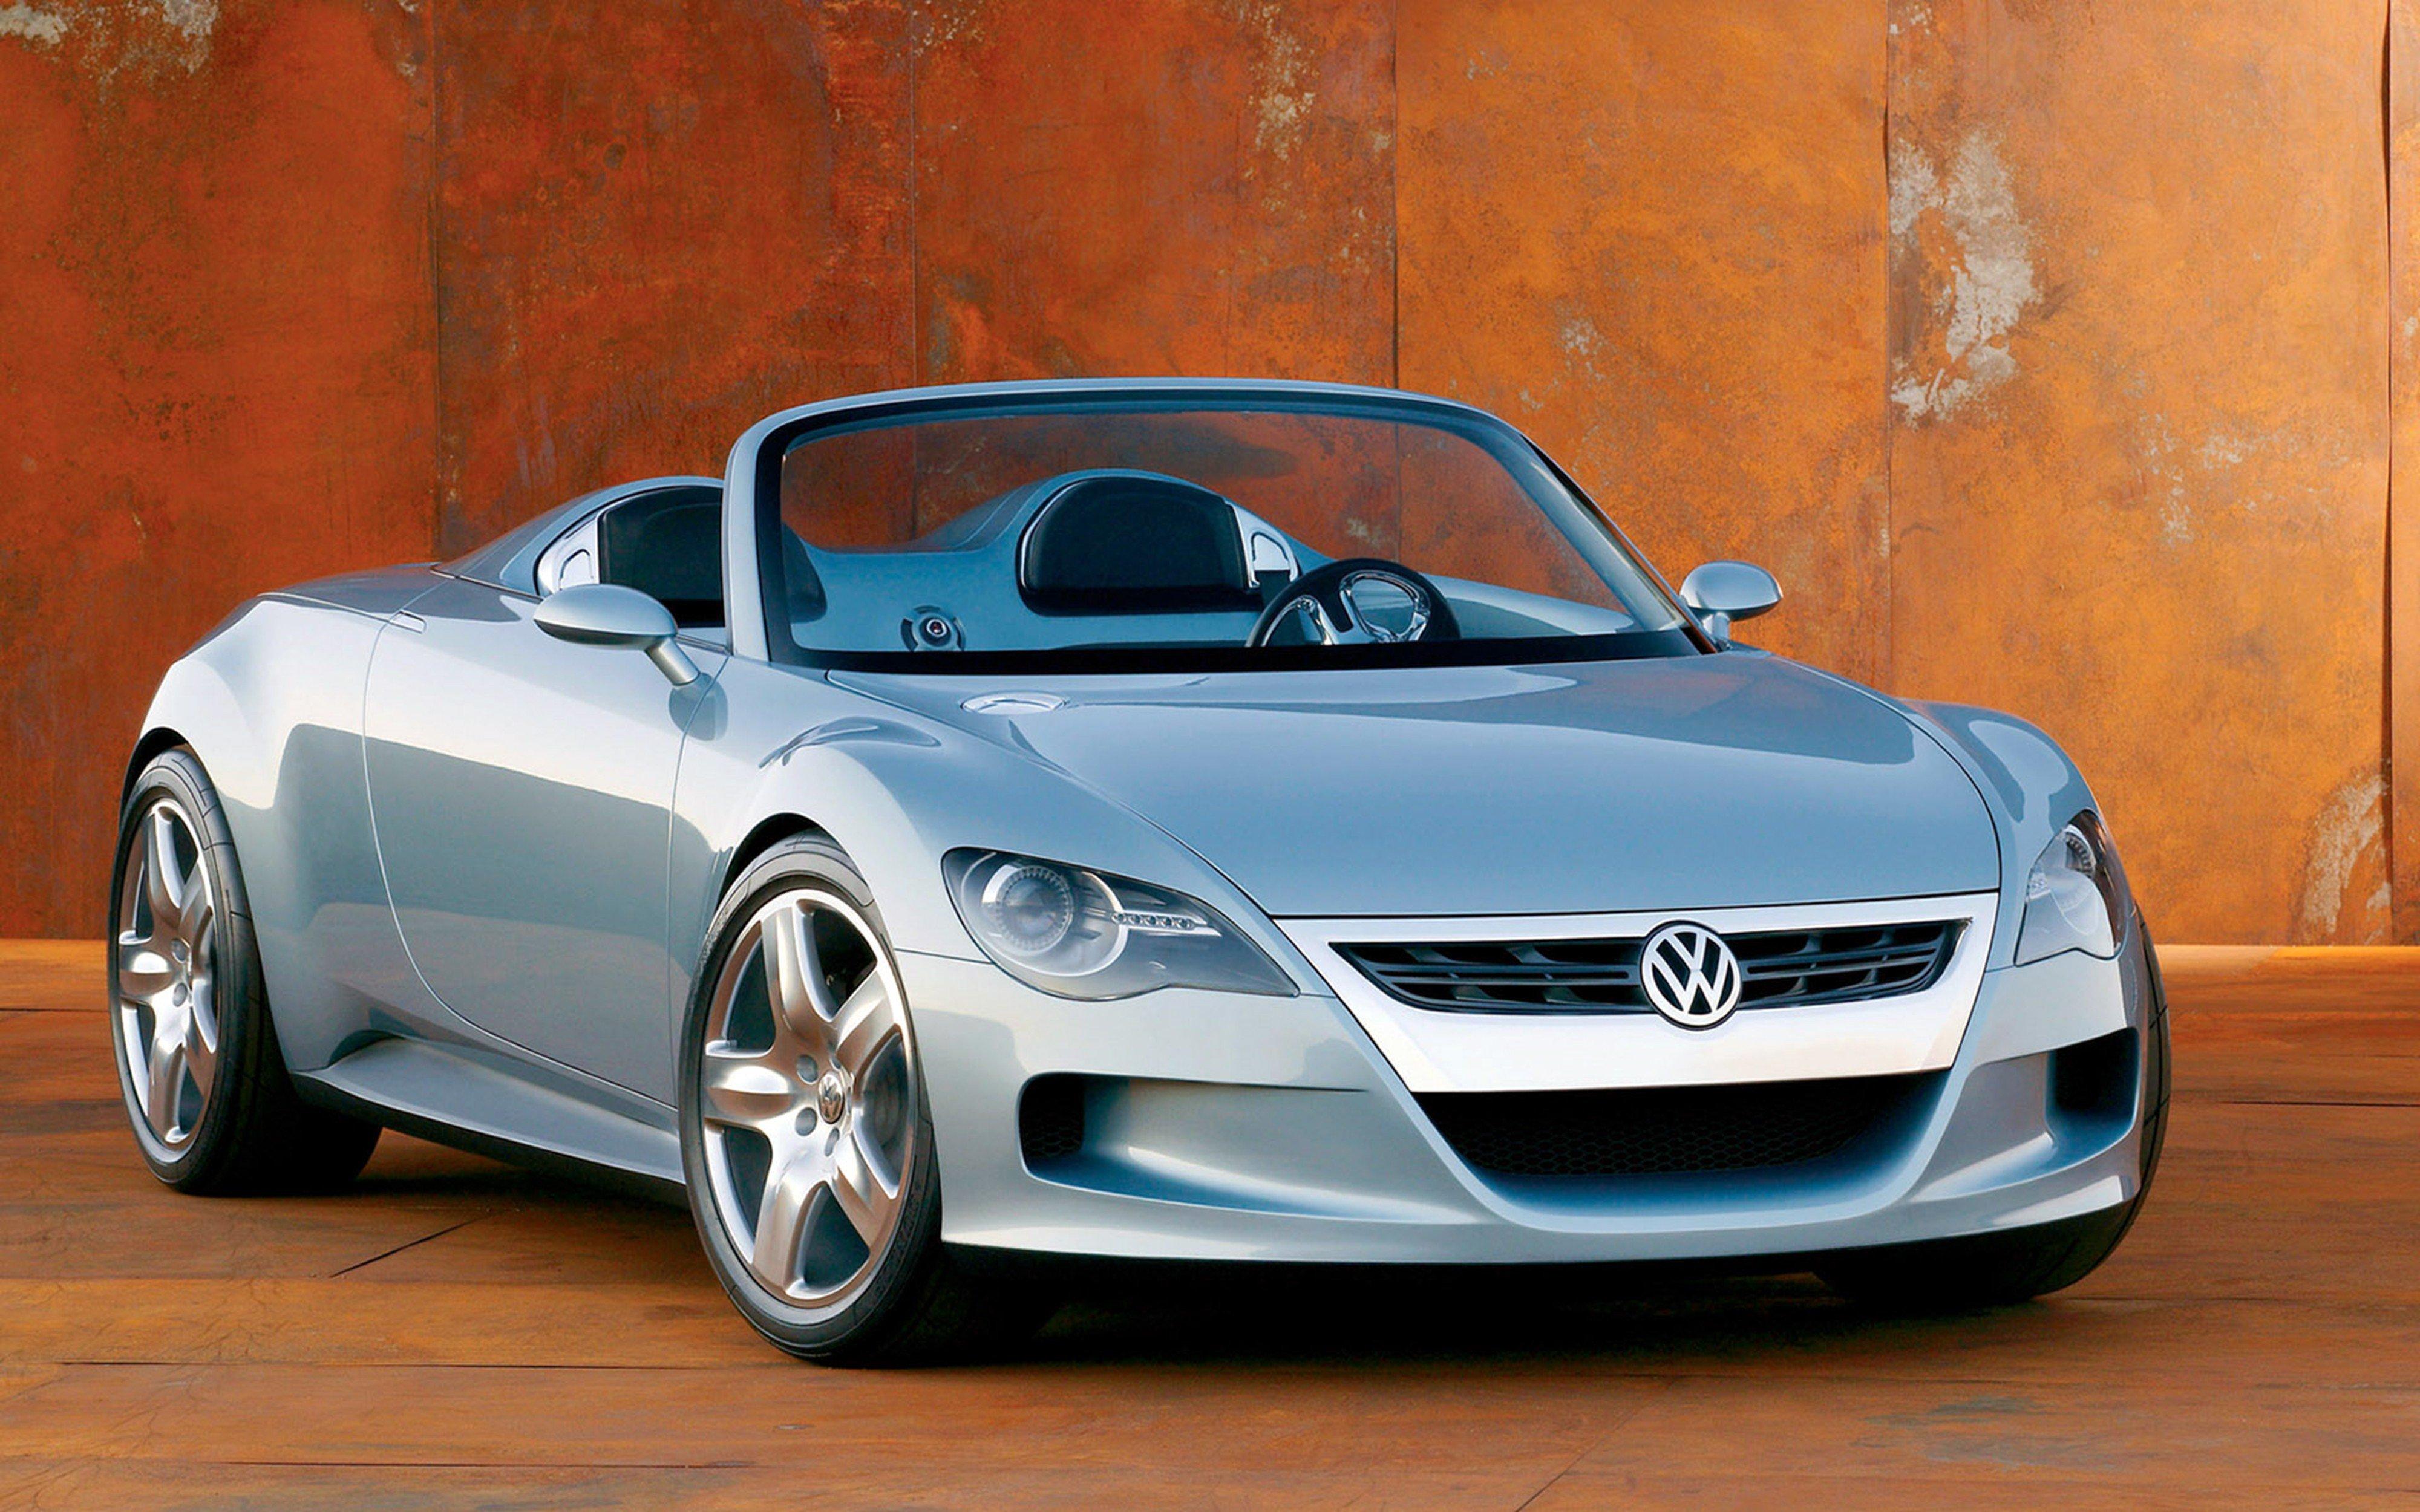 2003 Volkswagen Concept R Car Convertible Sport Germany 4000x2500 Wallpaper  | 4000x2500 | 349900 | WallpaperUP